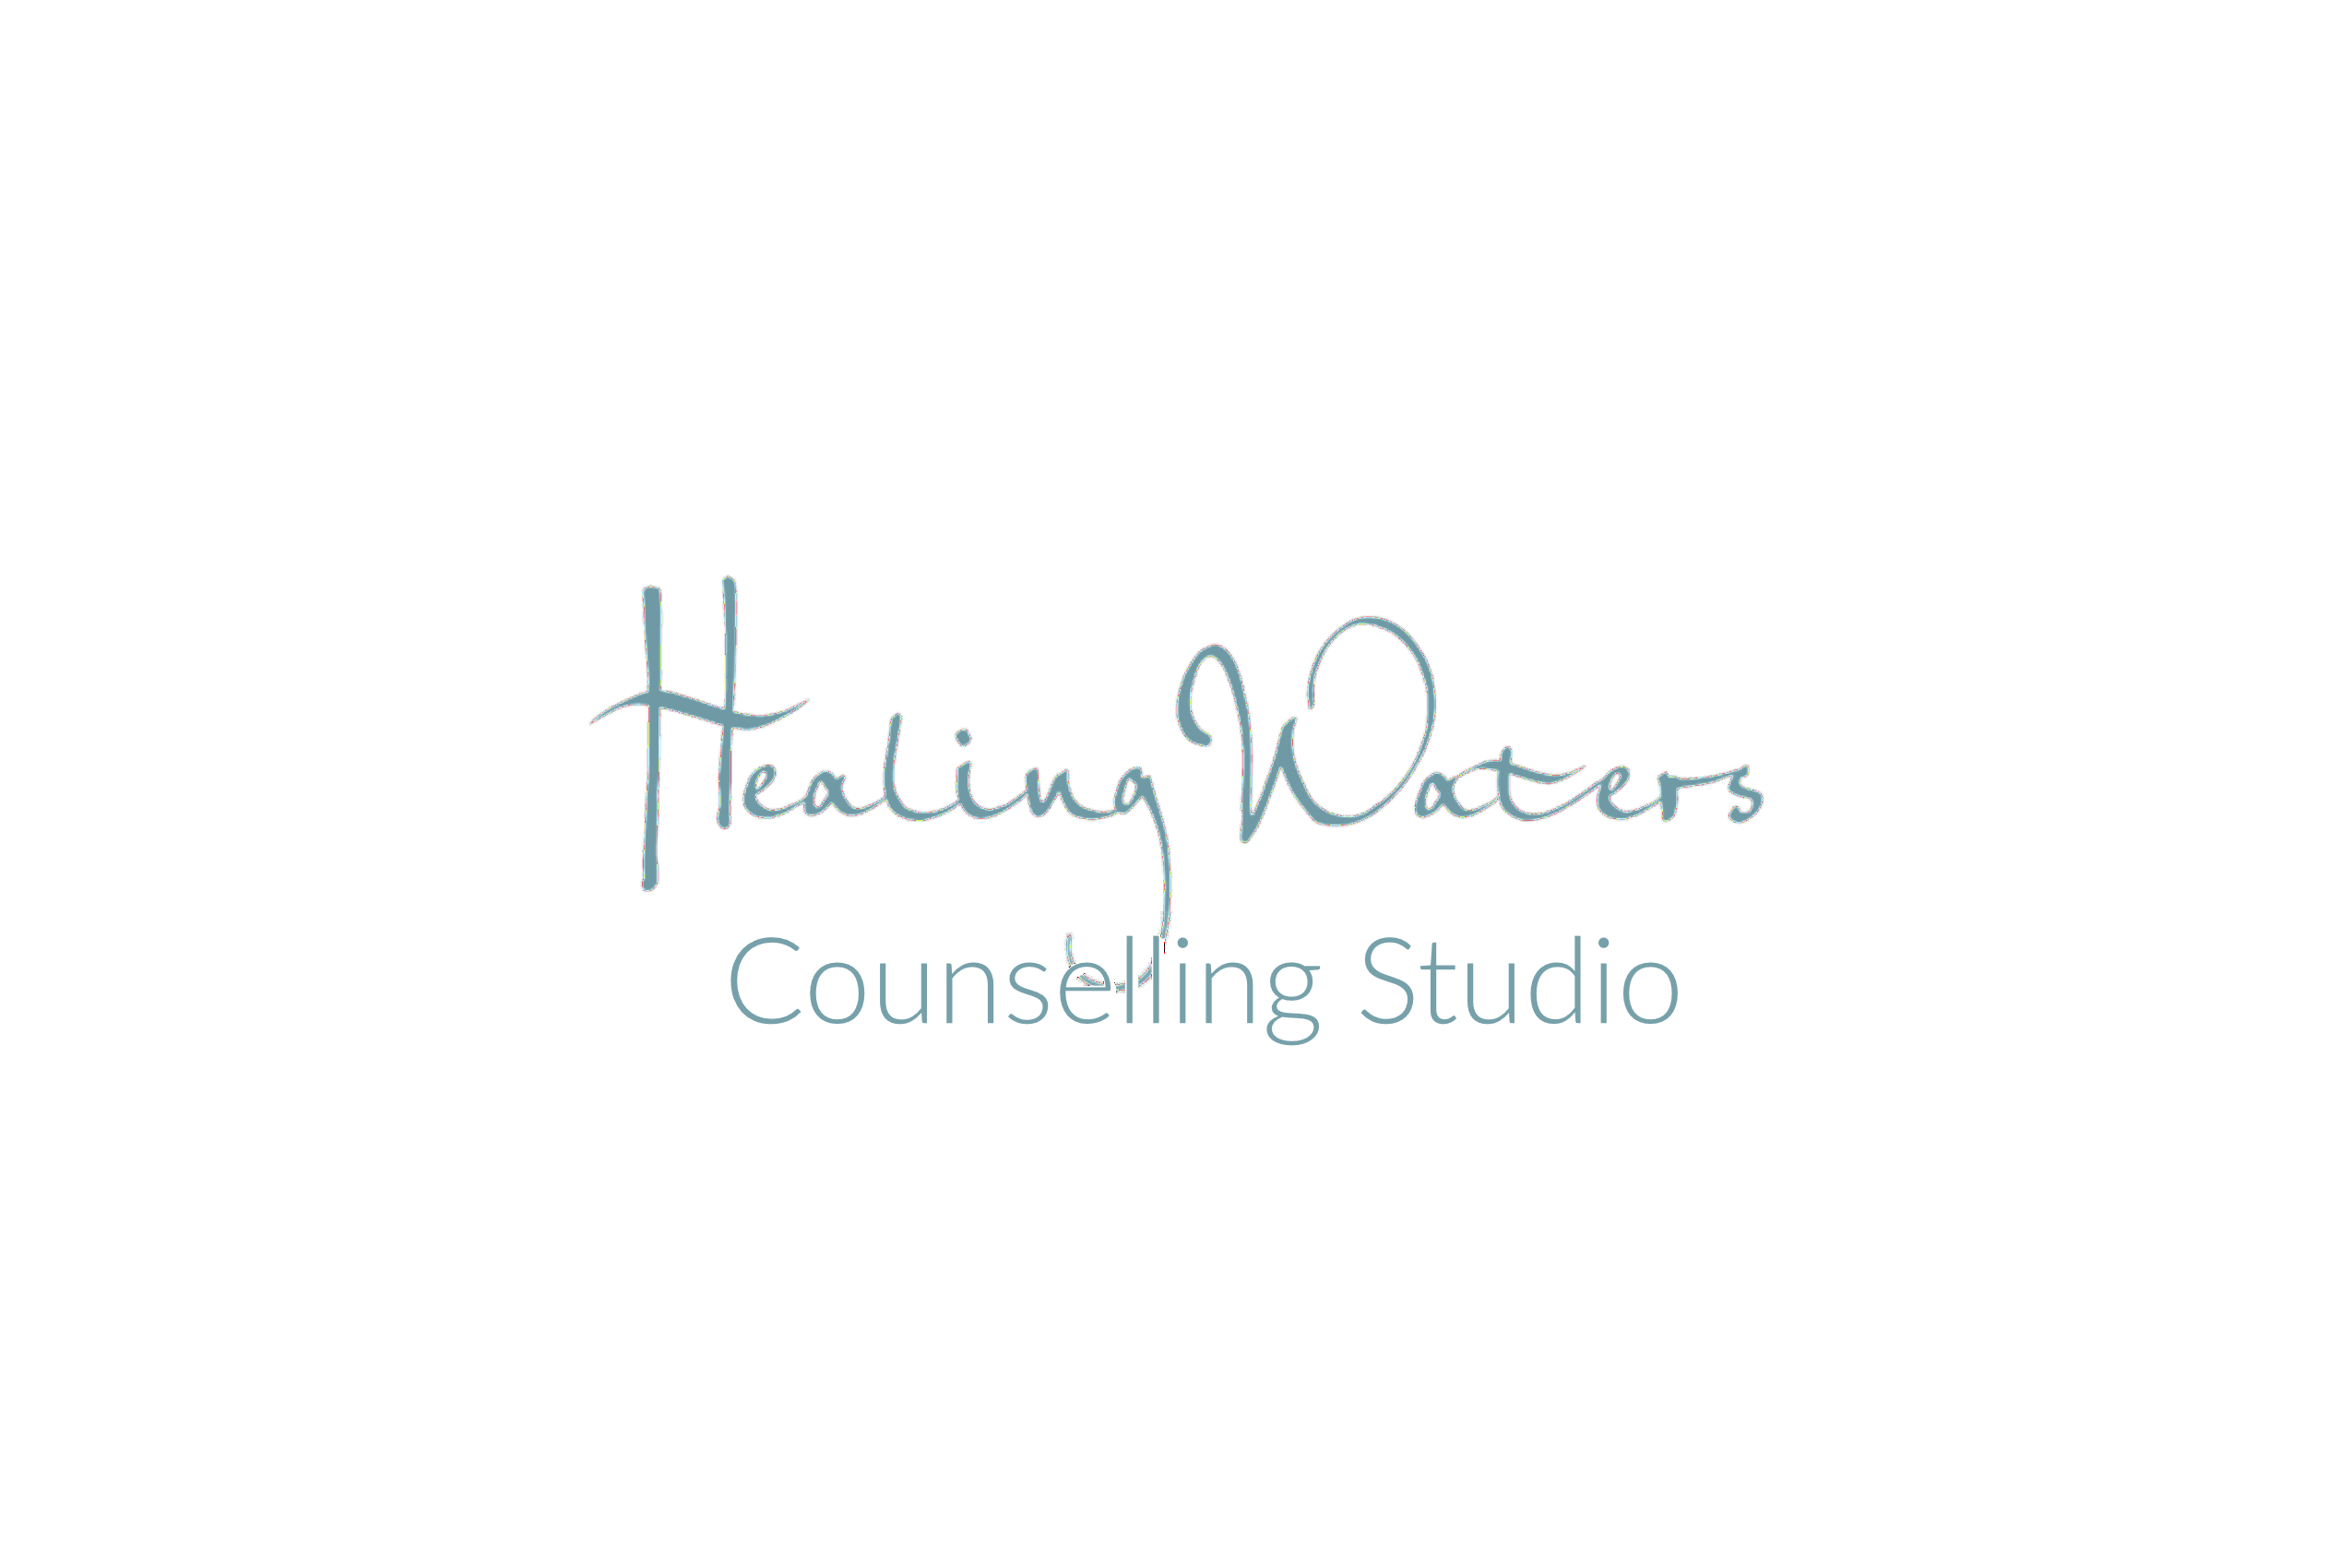 Healing Waters Counselling Studio